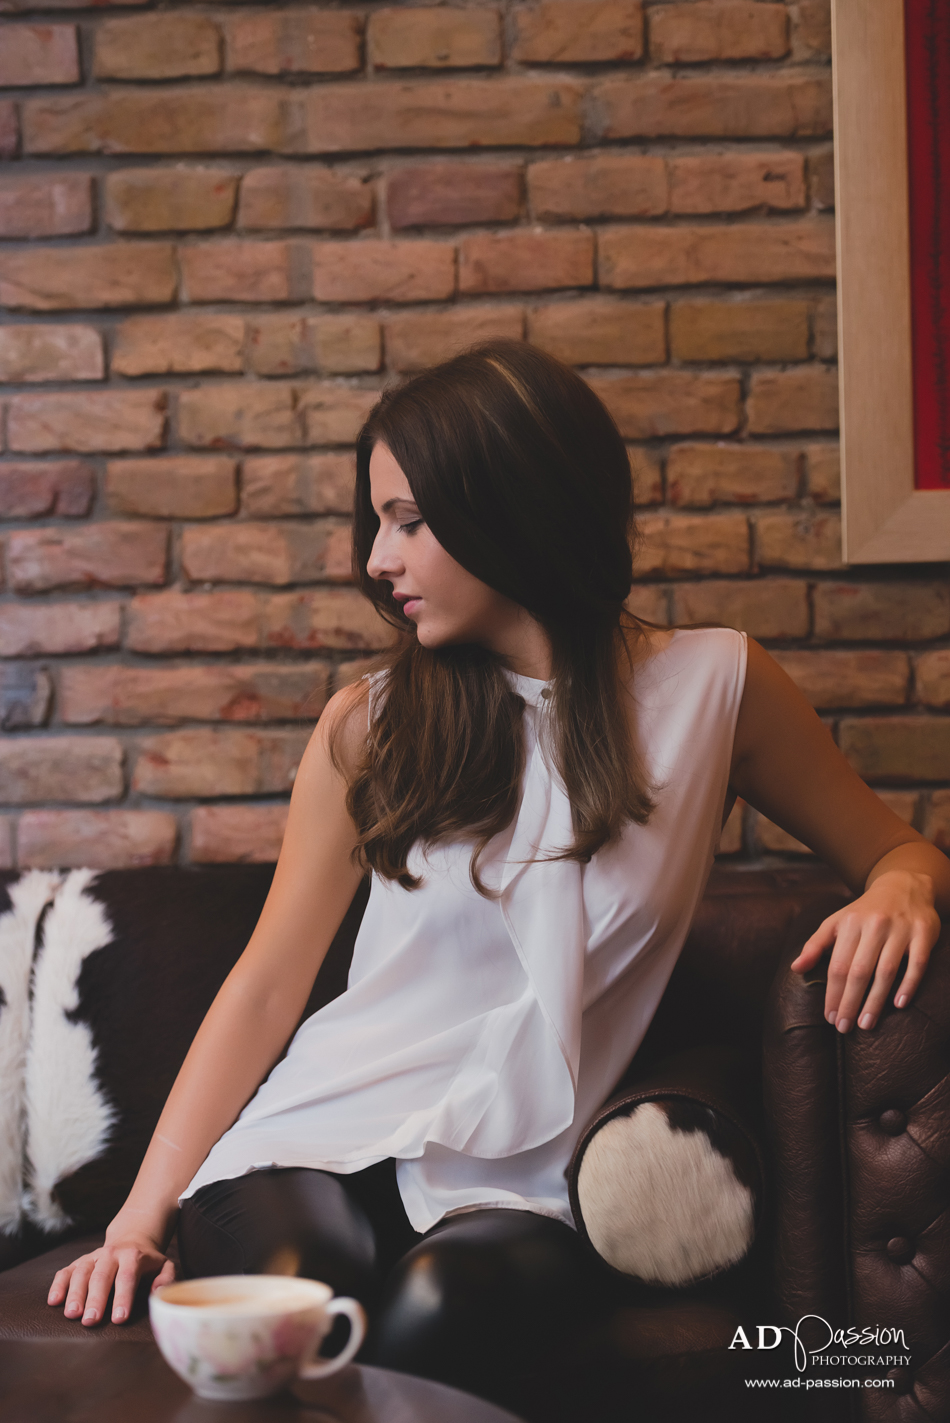 AD Passion Photography | rahela_fotografie-portret-timisoara_0020 | Adelin, Dida, fotograf profesionist, fotograf de nunta, fotografie de nunta, fotograf Timisoara, fotograf Craiova, fotograf Bucuresti, fotograf Arad, nunta Timisoara, nunta Arad, nunta Bucuresti, nunta Craiova